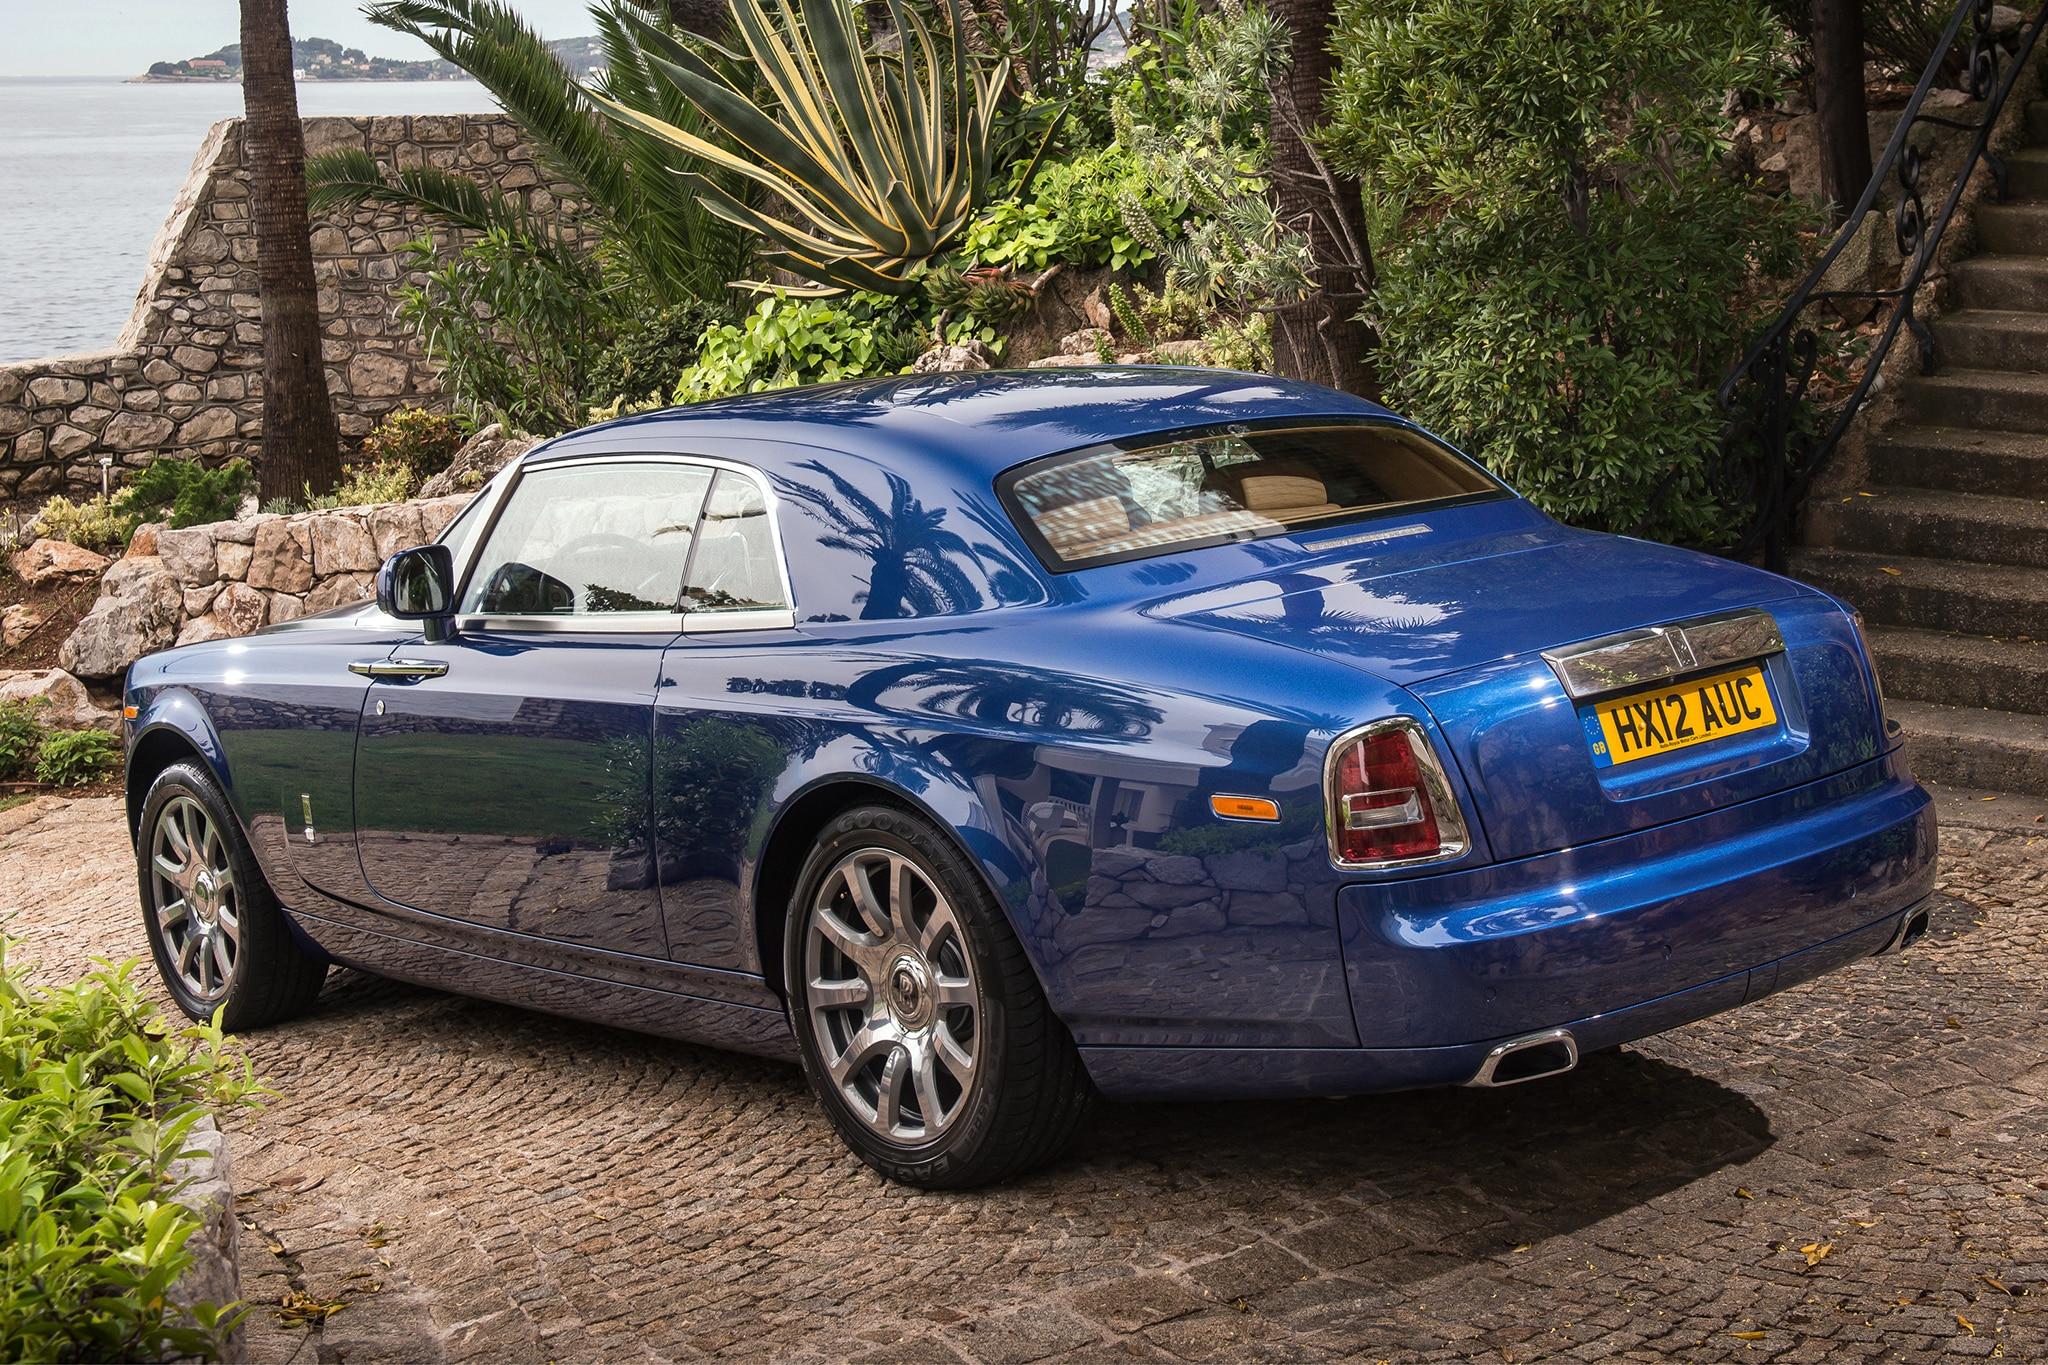 2014 Rolls-Royce Phantom: Around The Block